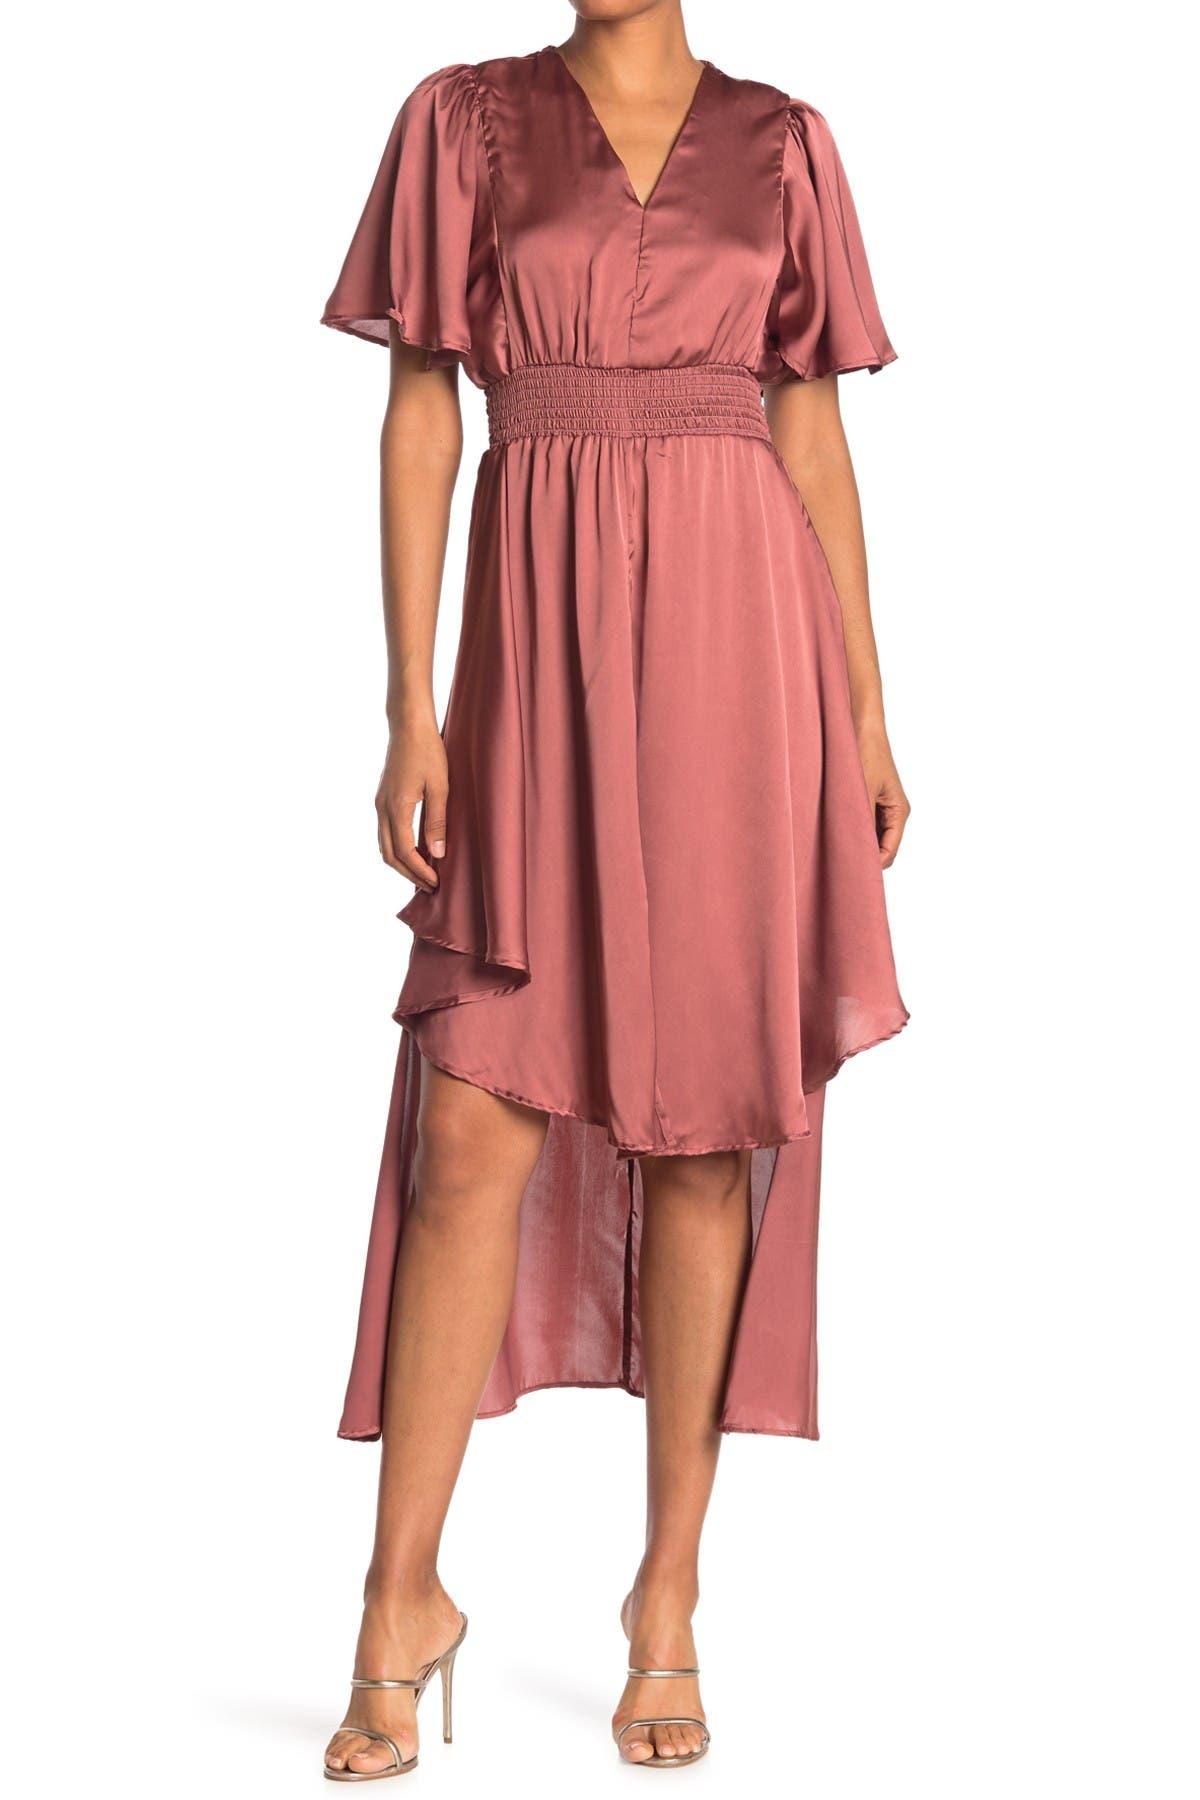 Image of Angie V-Neck High/Low Satin Dress